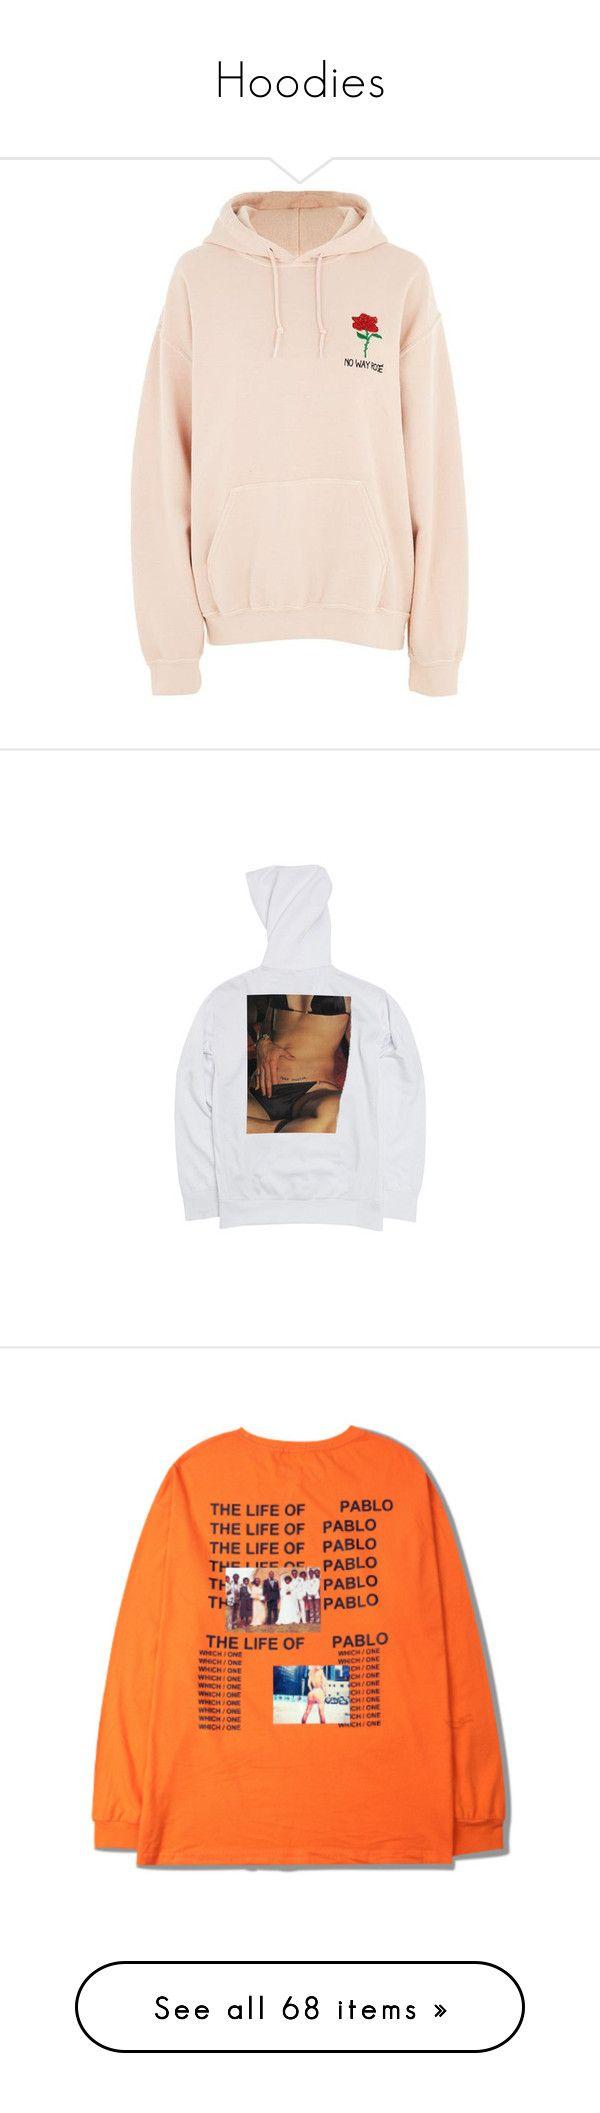 """Hoodies"" by baaby-dooll ❤ liked on Polyvore featuring tops, hoodies, pink, petite hoodies, sweatshirt hoodies, hoodie top, petite hoodie, petite tops, sweaters and t-shirts"